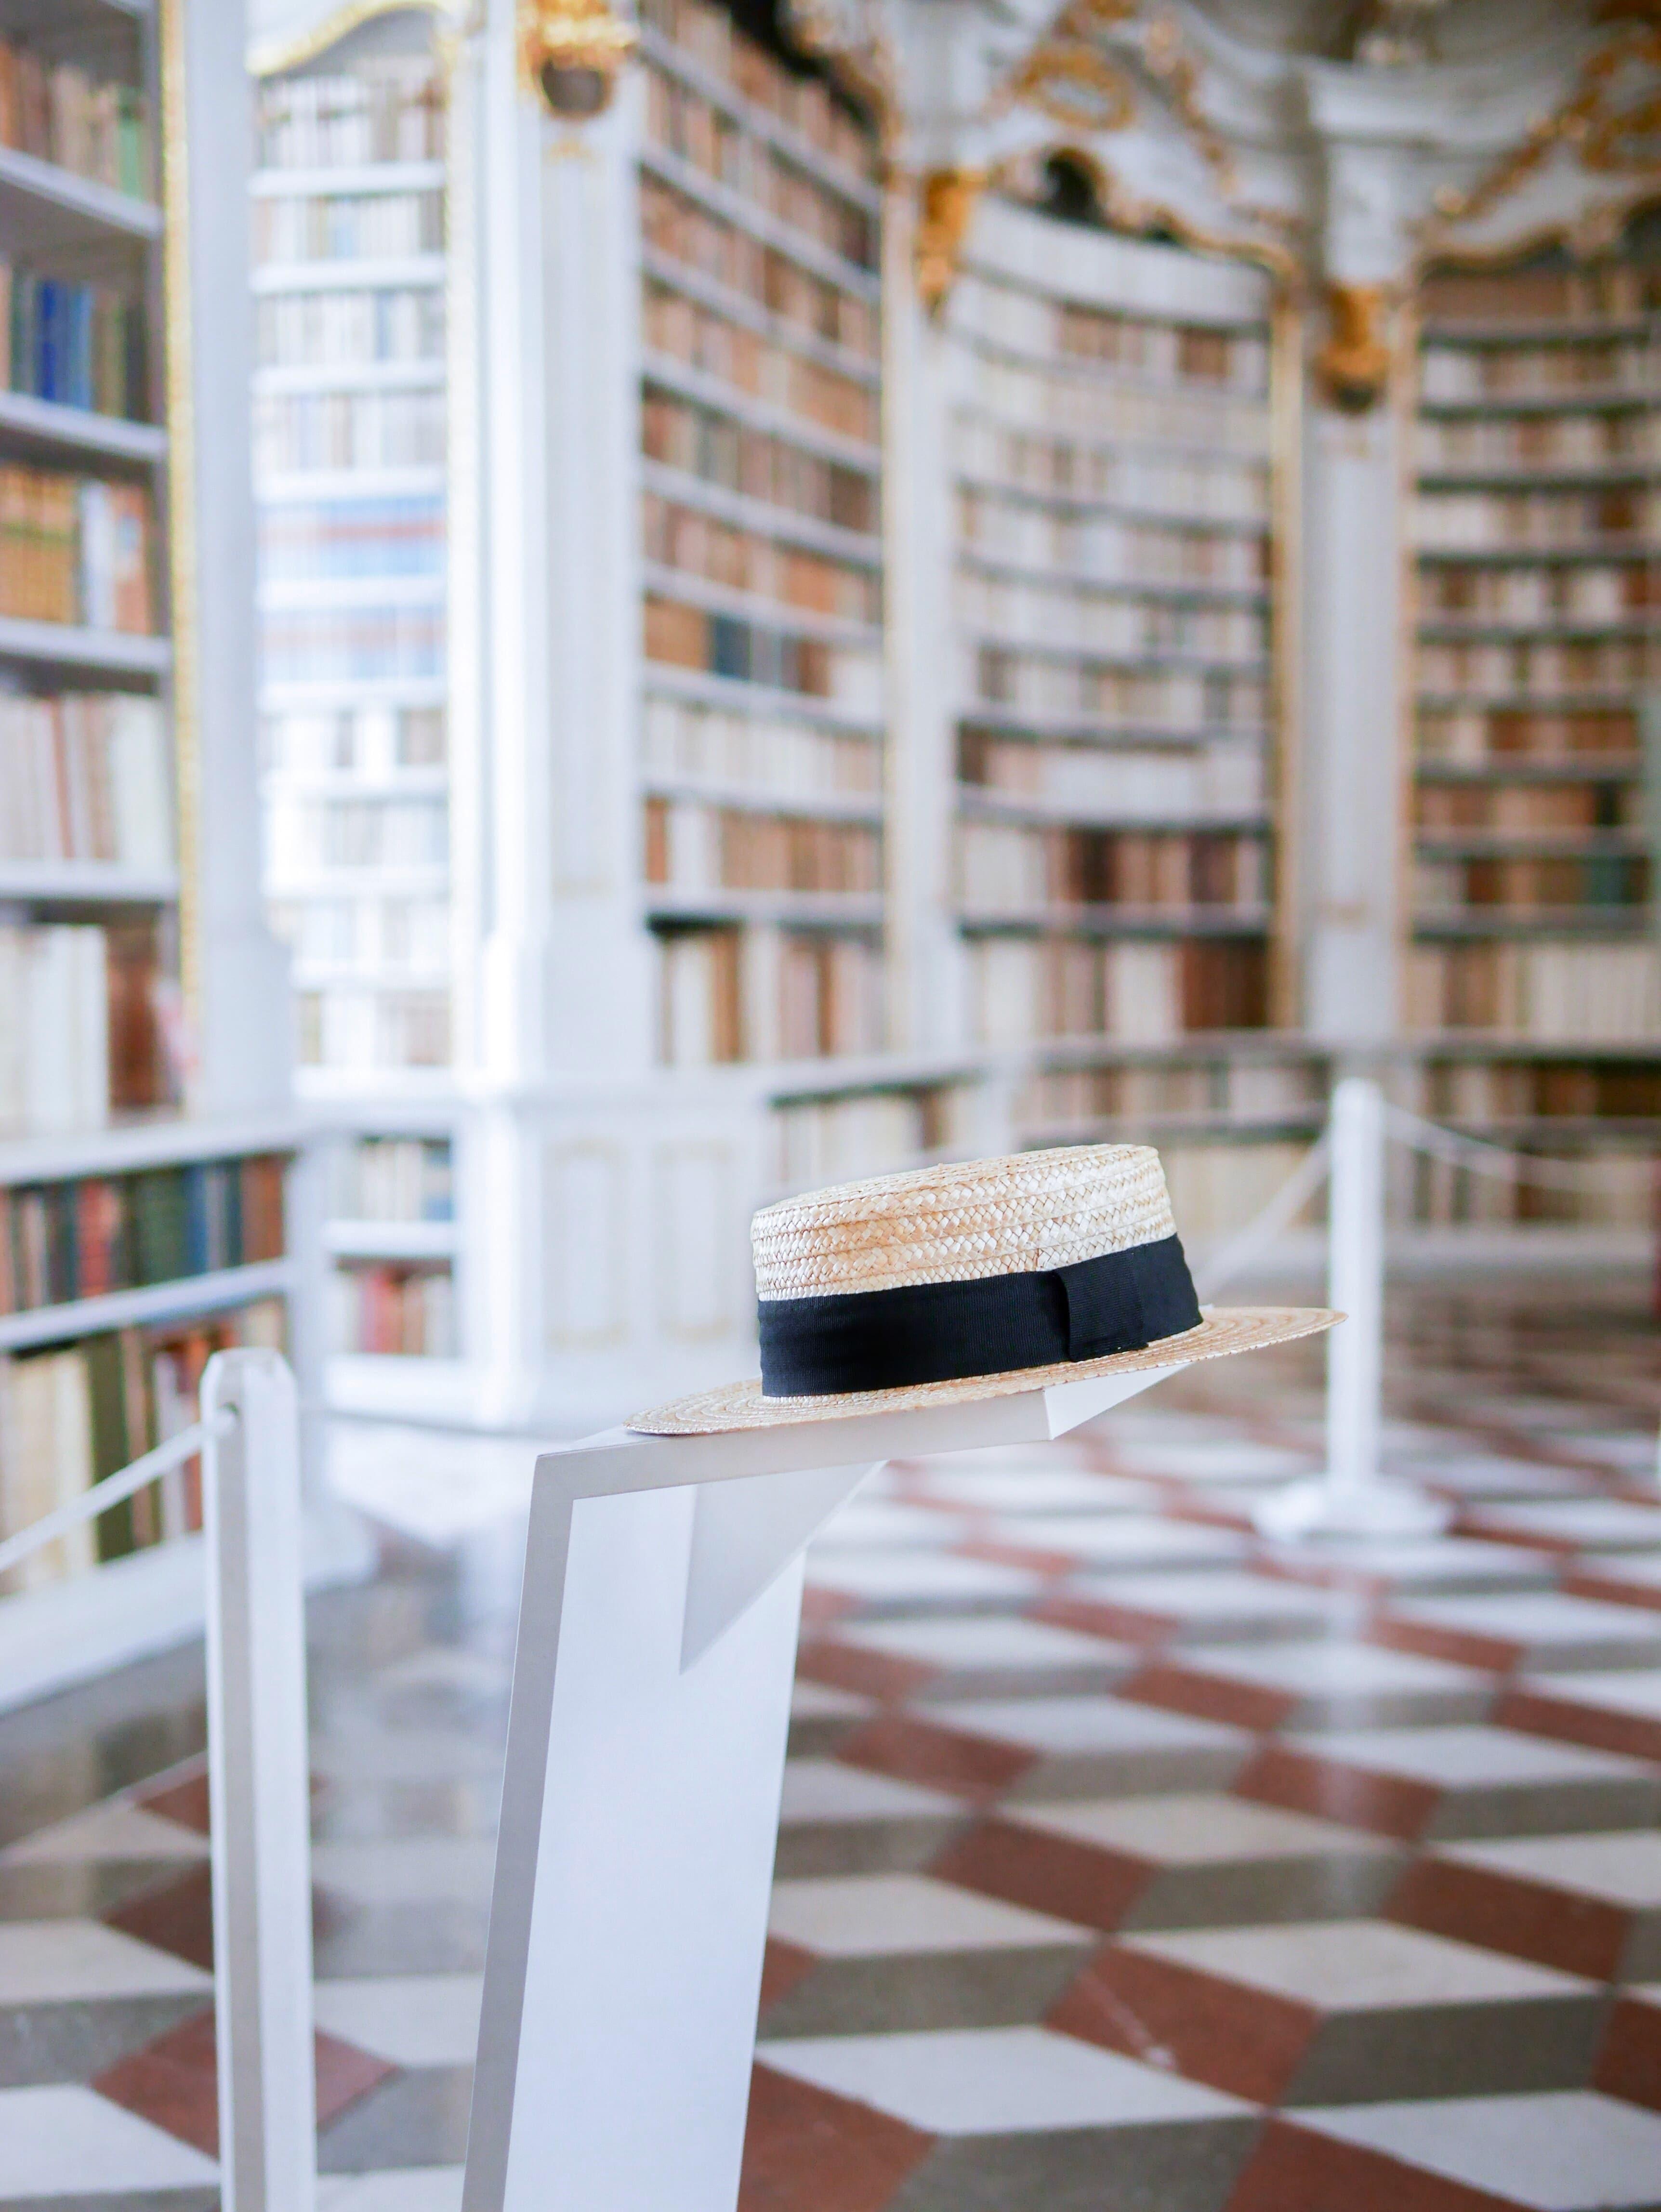 Admont Abbey beautiful library